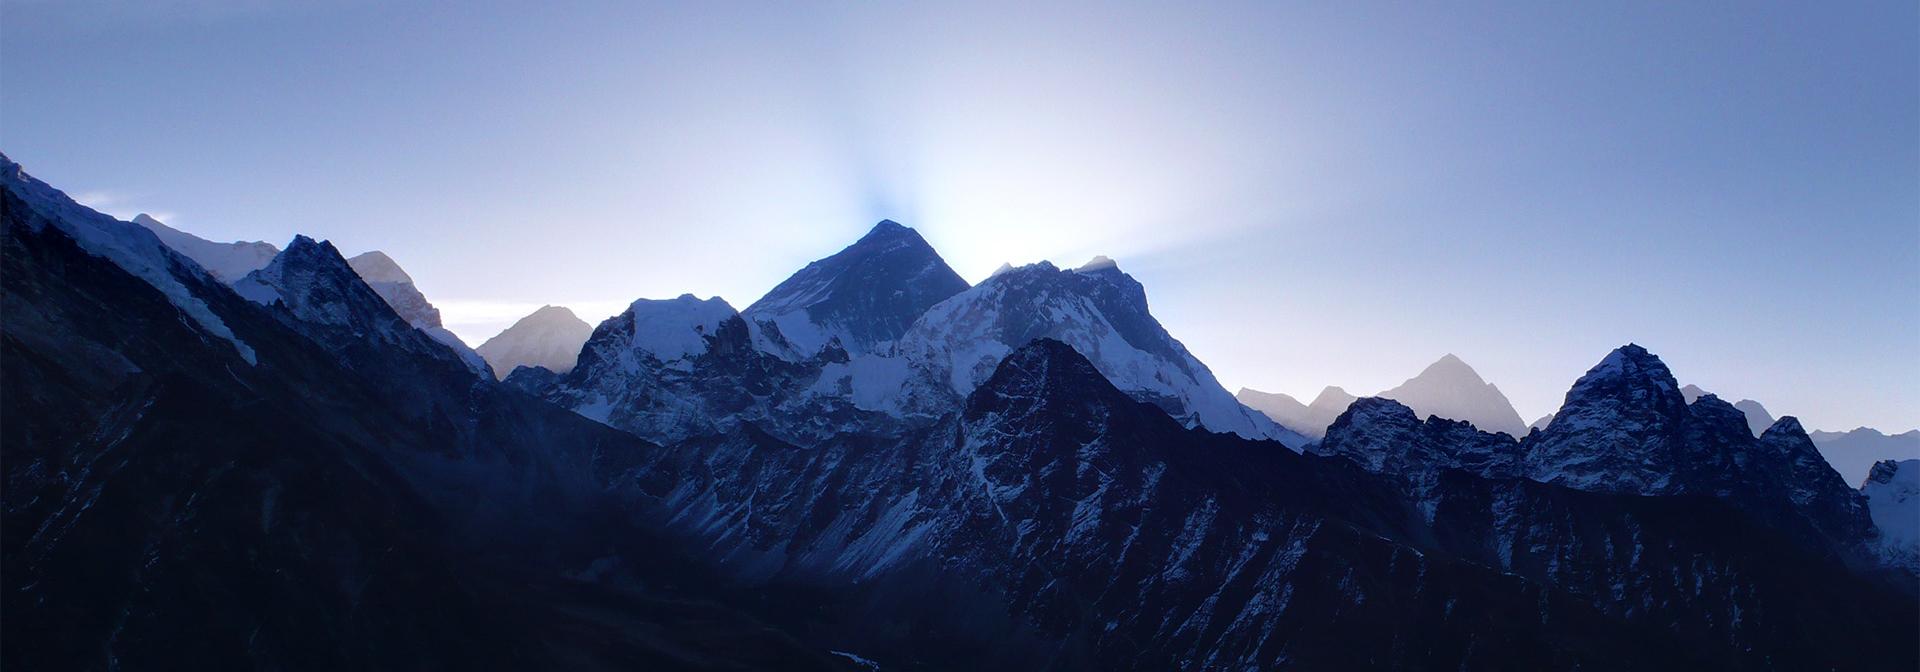 Climate Change Could Melt Everest Region's Glaciers